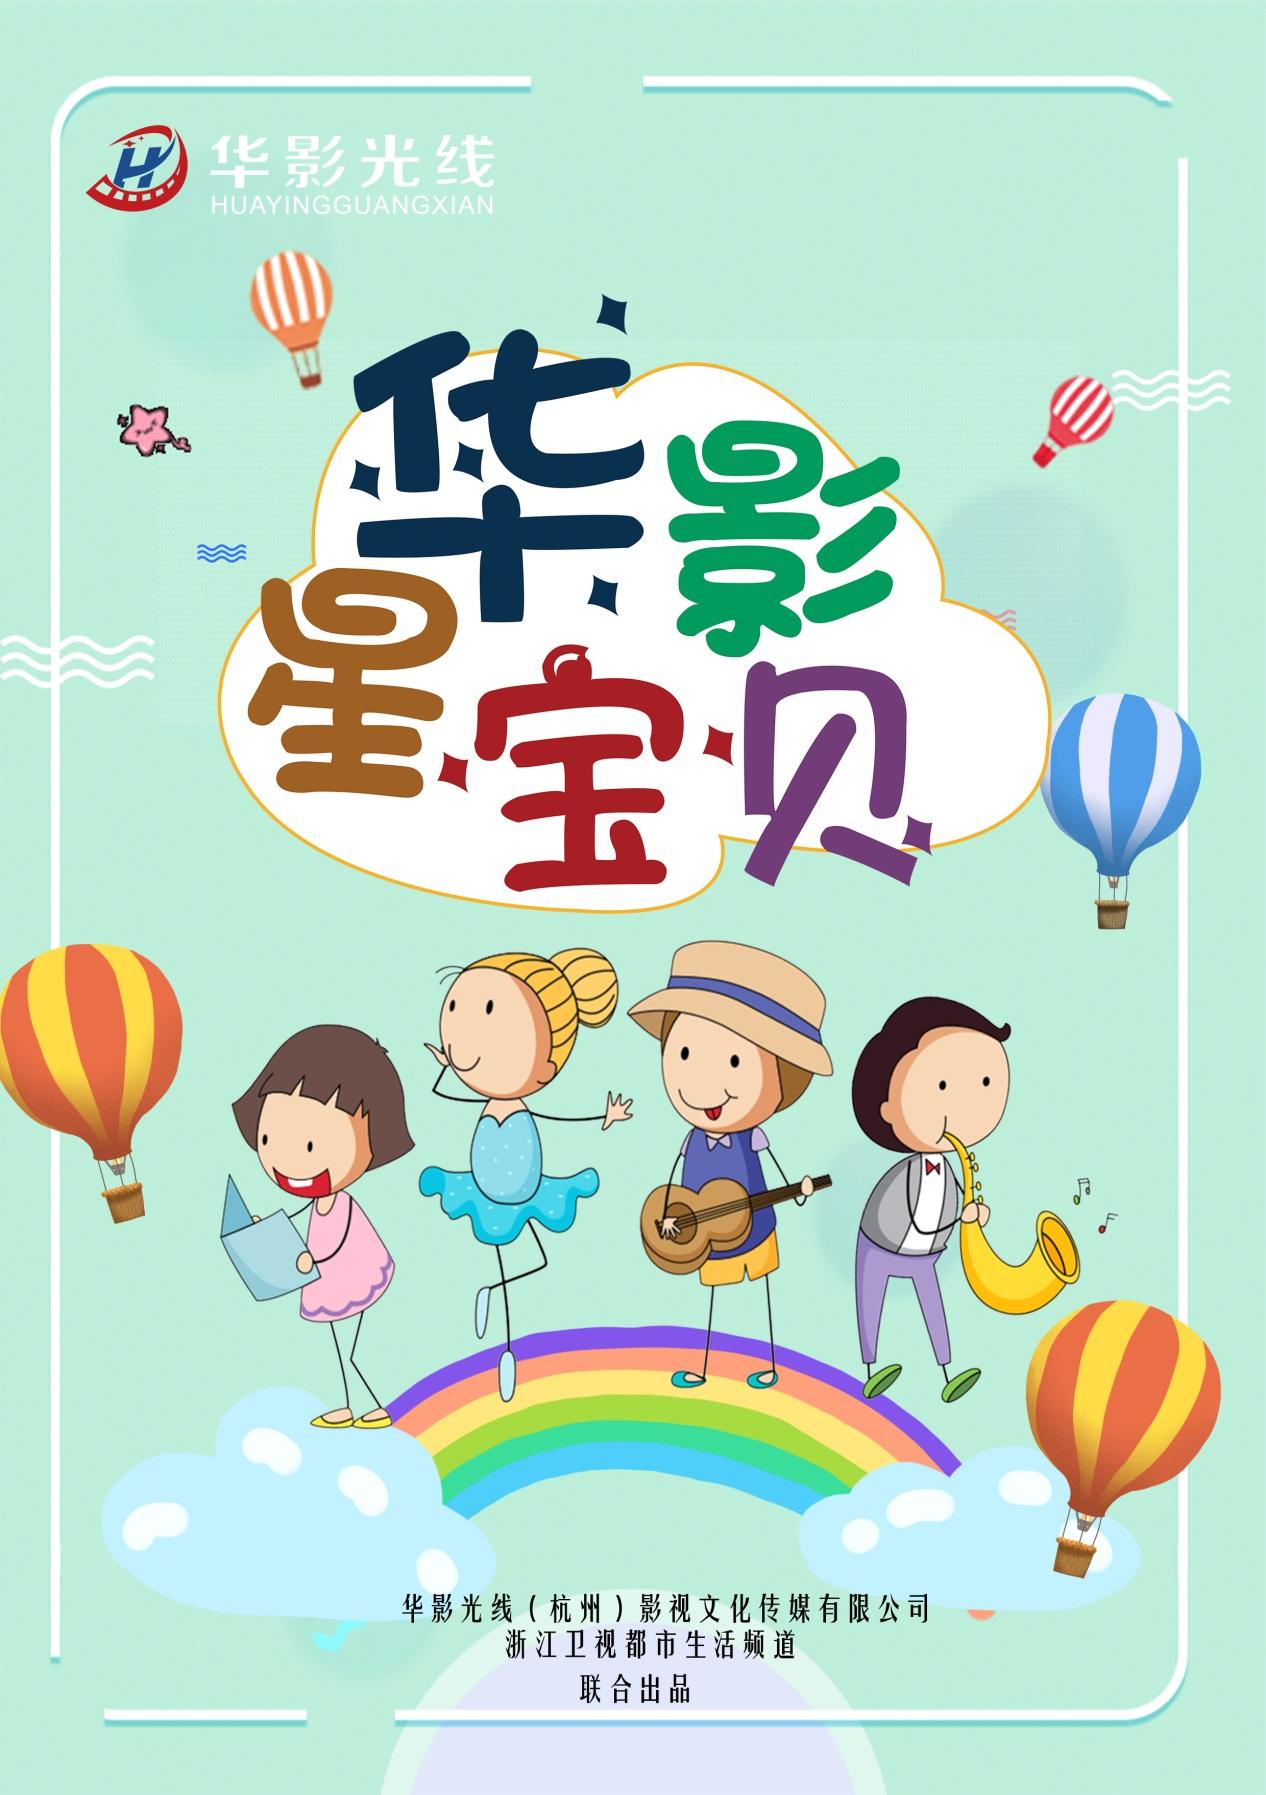 <b>《华影星宝贝》大型栏目在杭州启动 走进杭州华影光线</b>